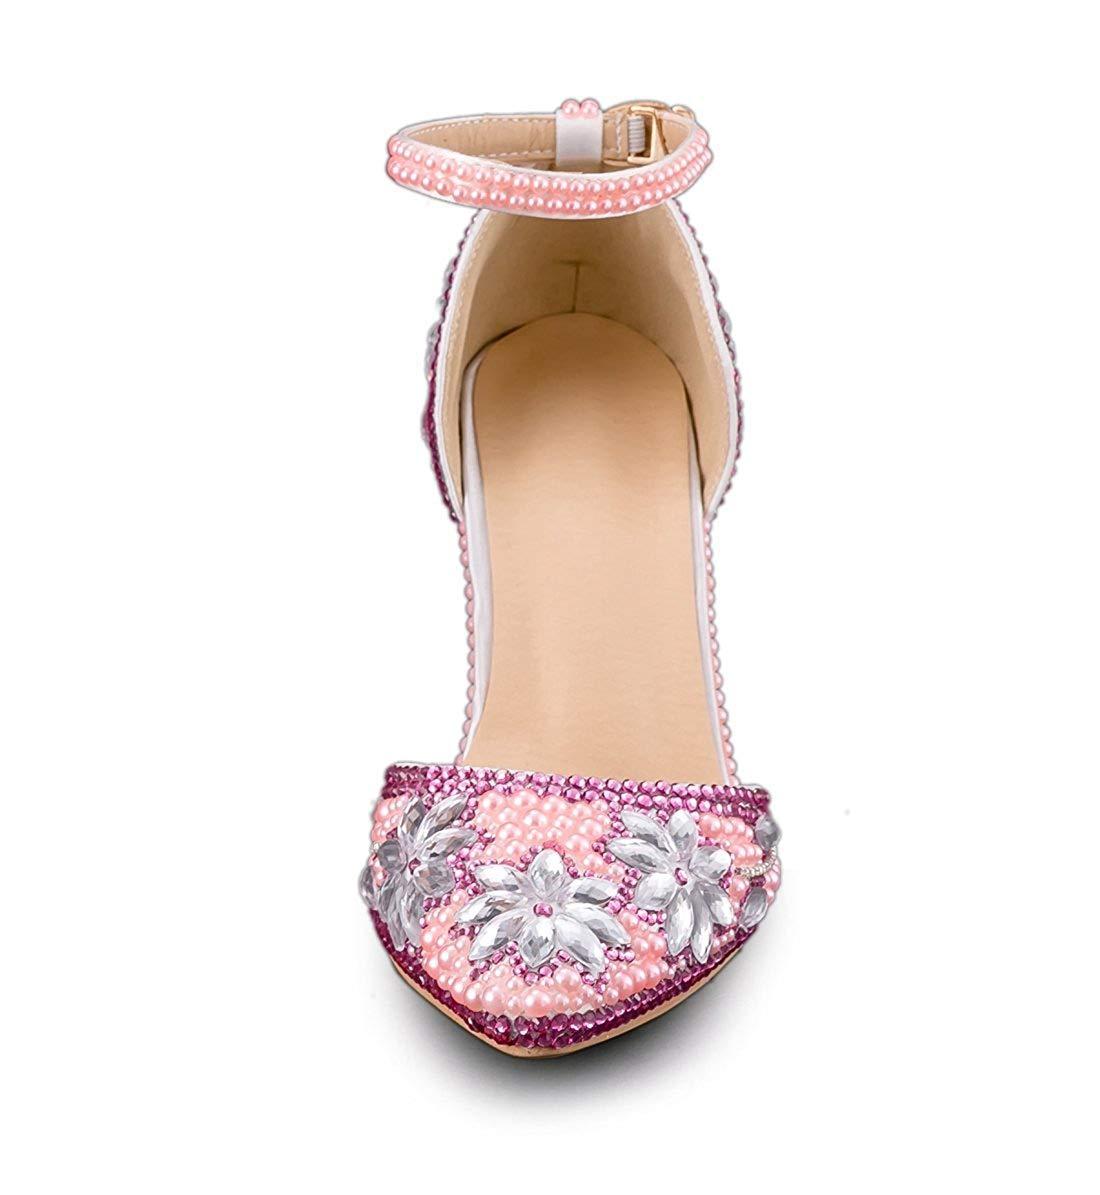 Qiusa Frauen Blaumen Jem Studded Studded Studded High Heel Knöchelriemen Rosa Hochzeit Schuhe UK 4 (Farbe   - Größe   -) 514705